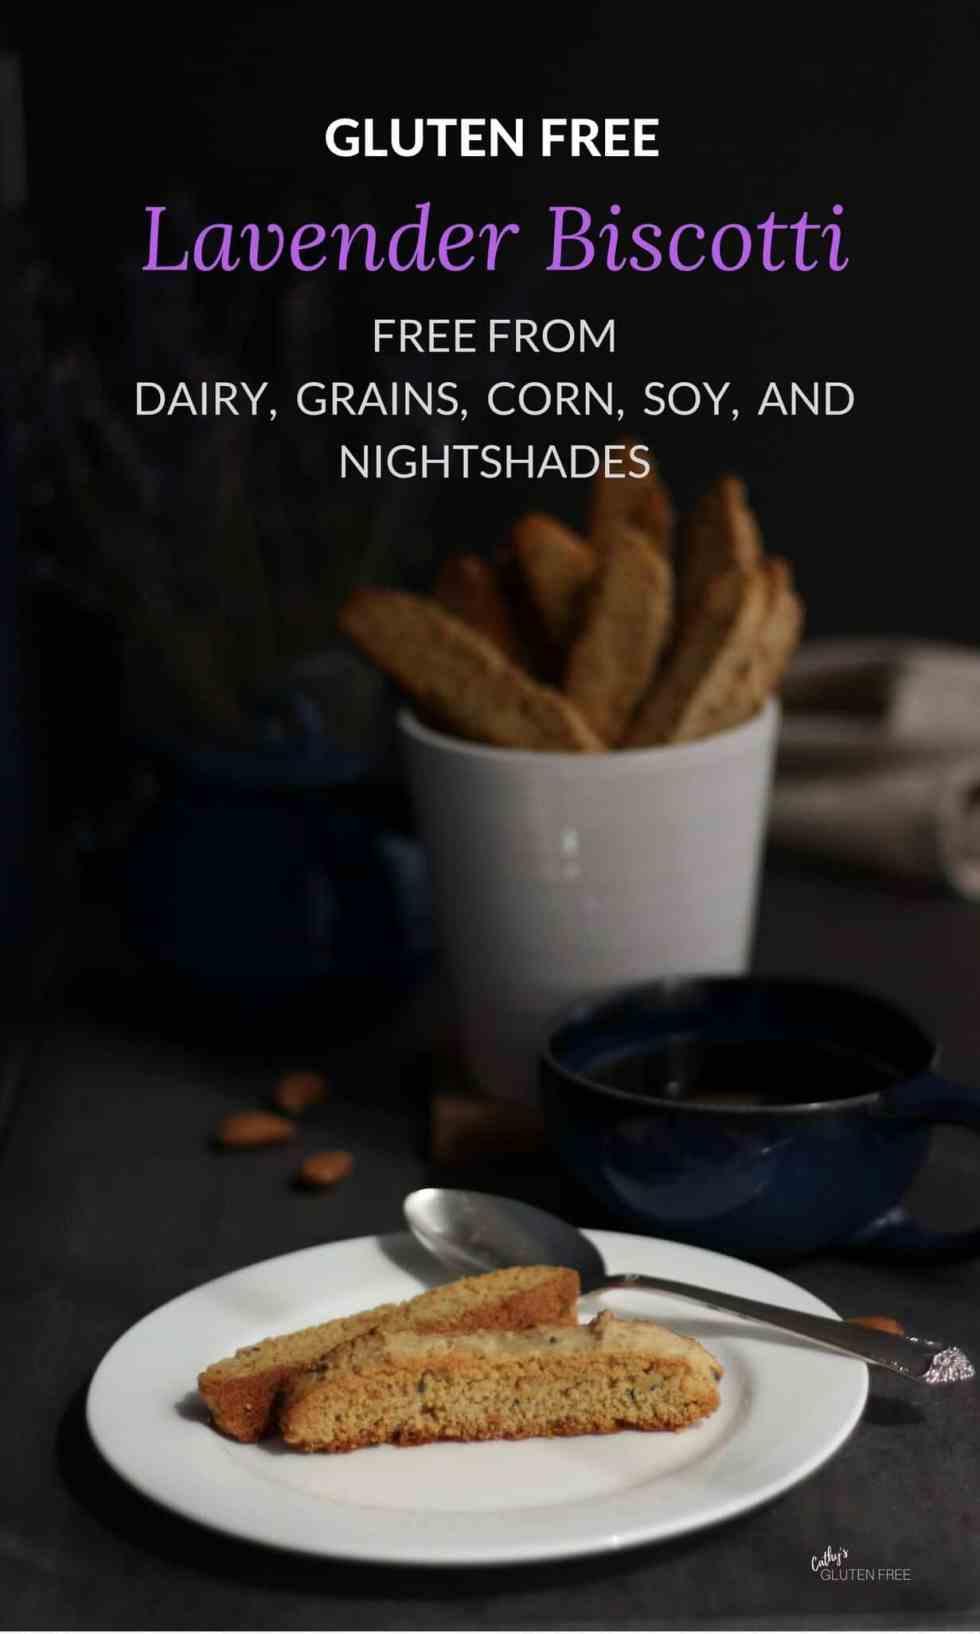 Lavender Biscotti | Free from dairy, grains, soy, nightshades, corn | CathysGlutenFree.com